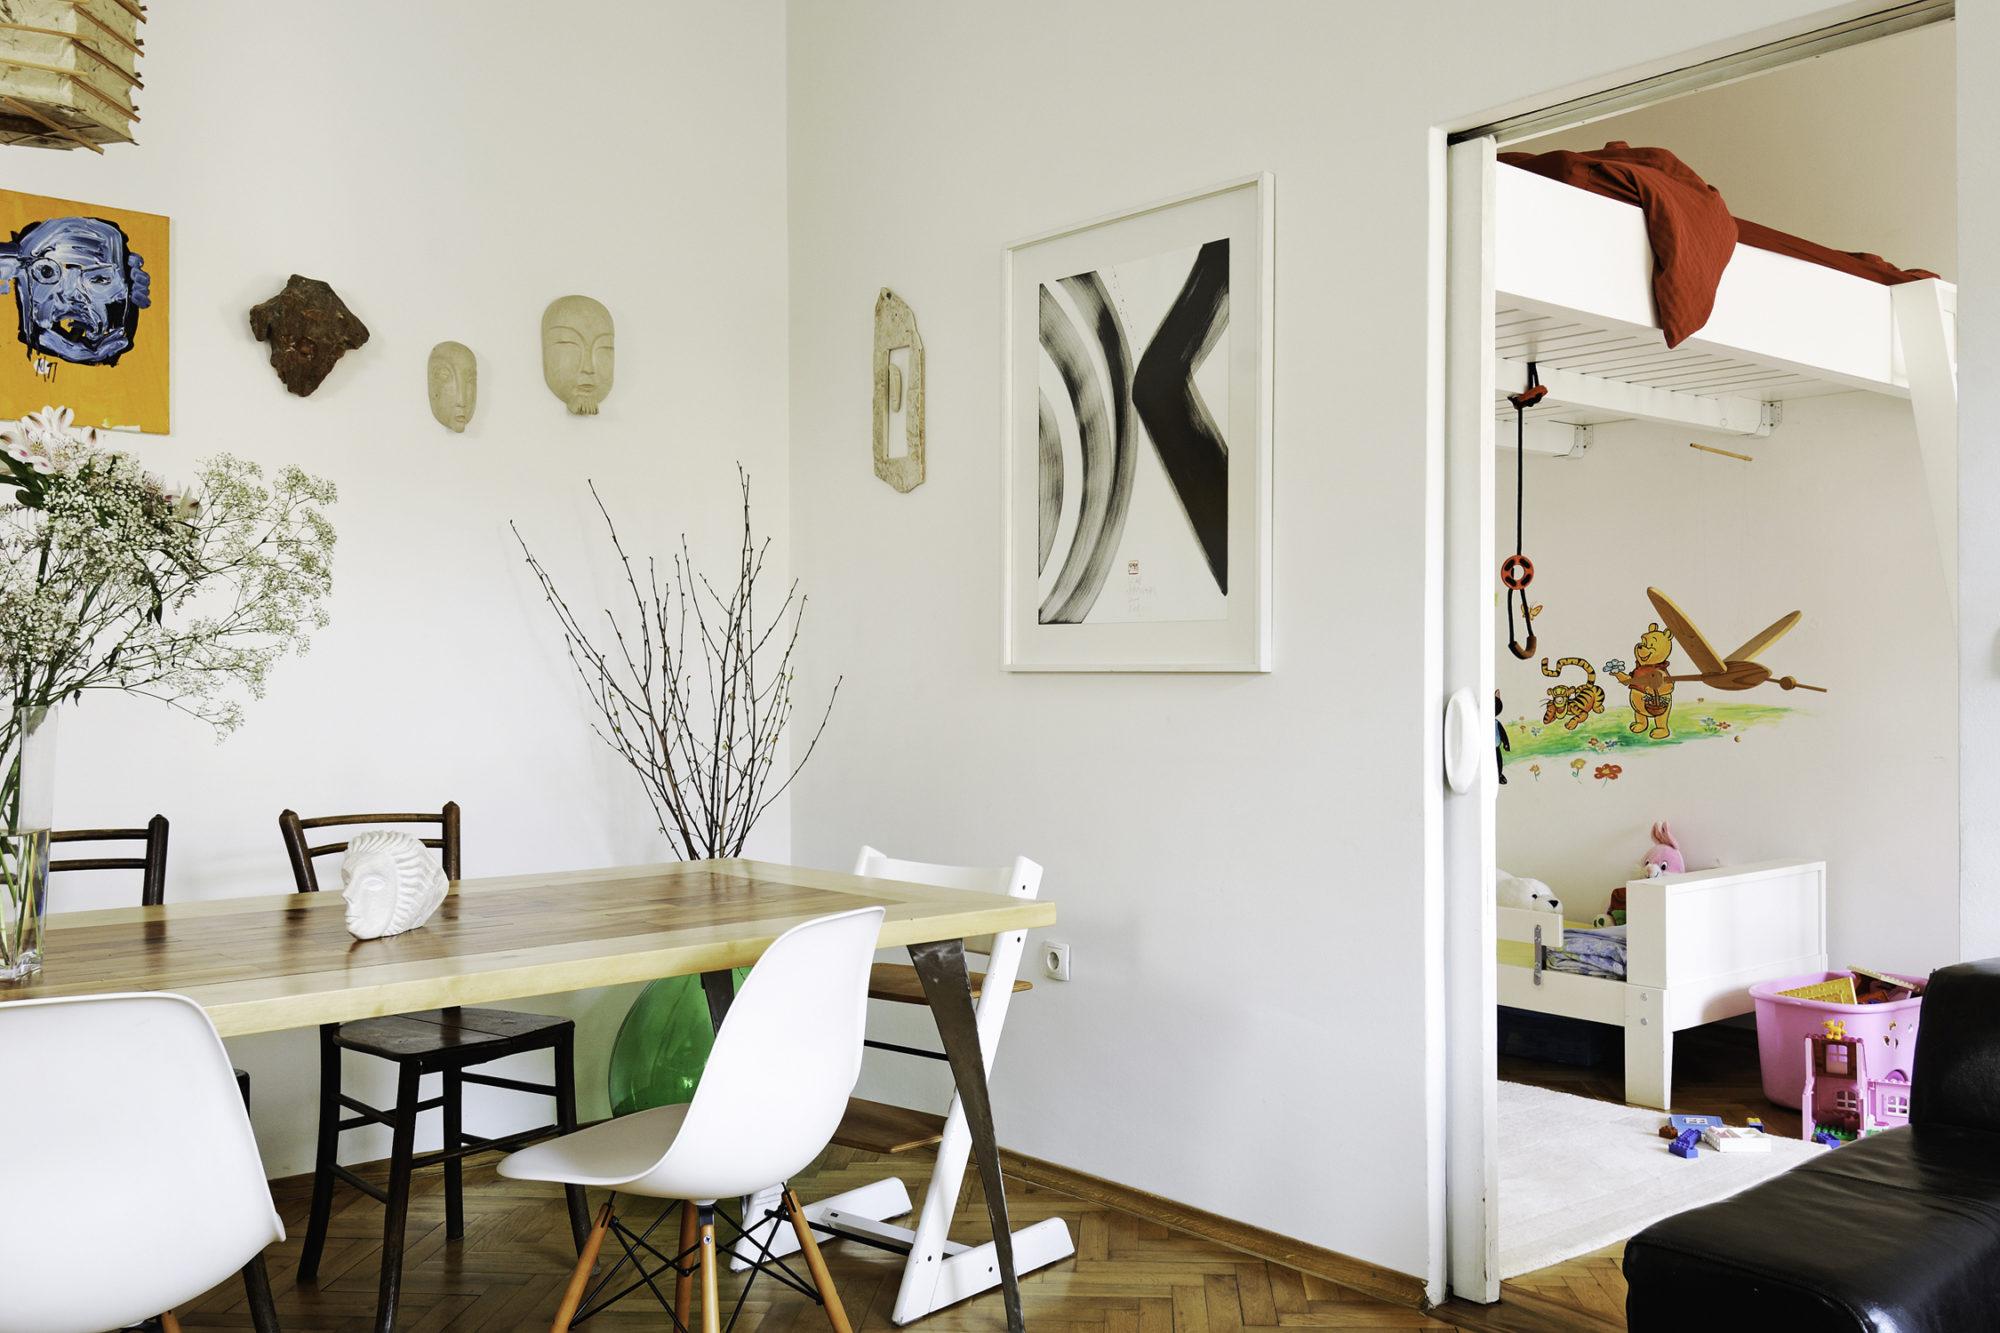 Interior and Wooden Furniture Design